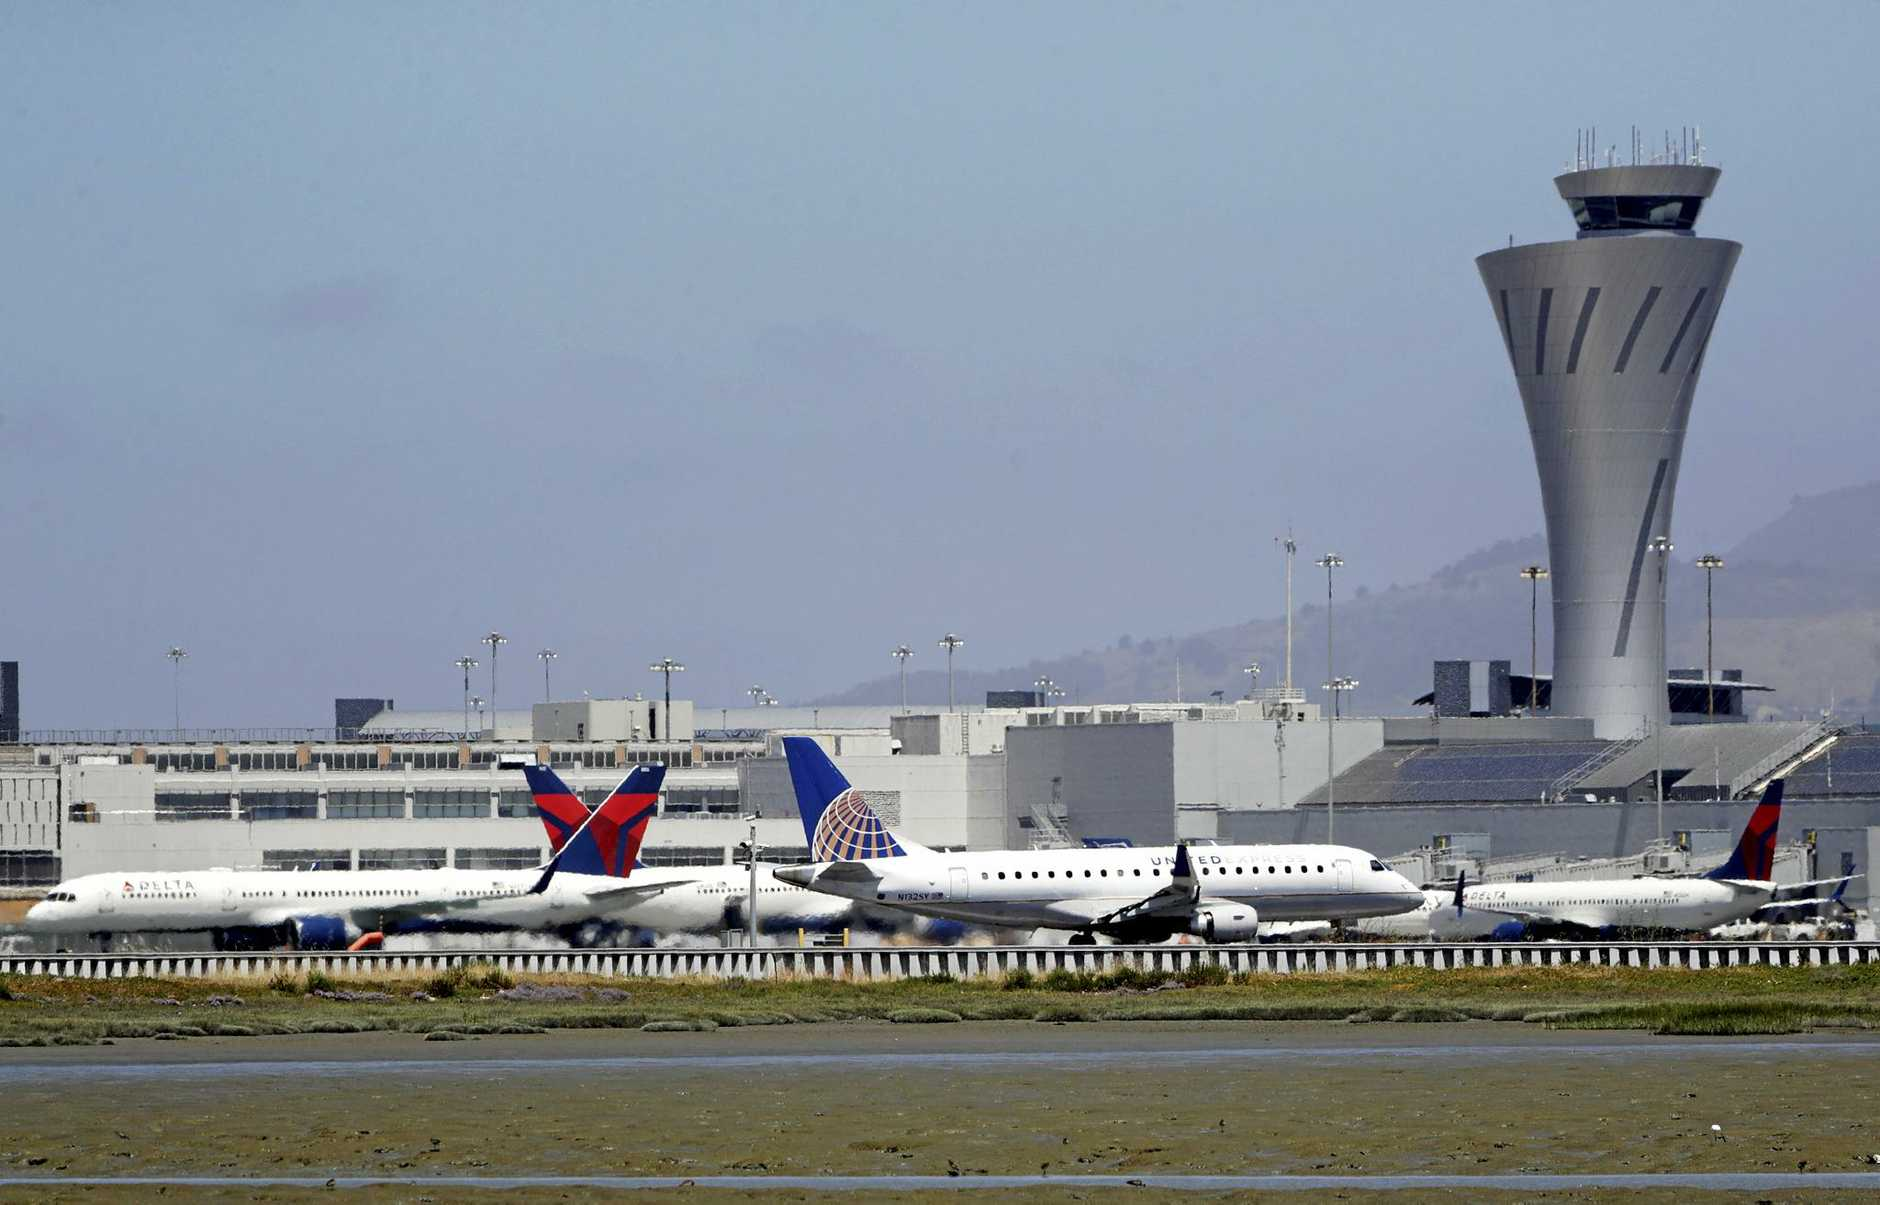 A pilot seeking to land at San Francisco International Airport has